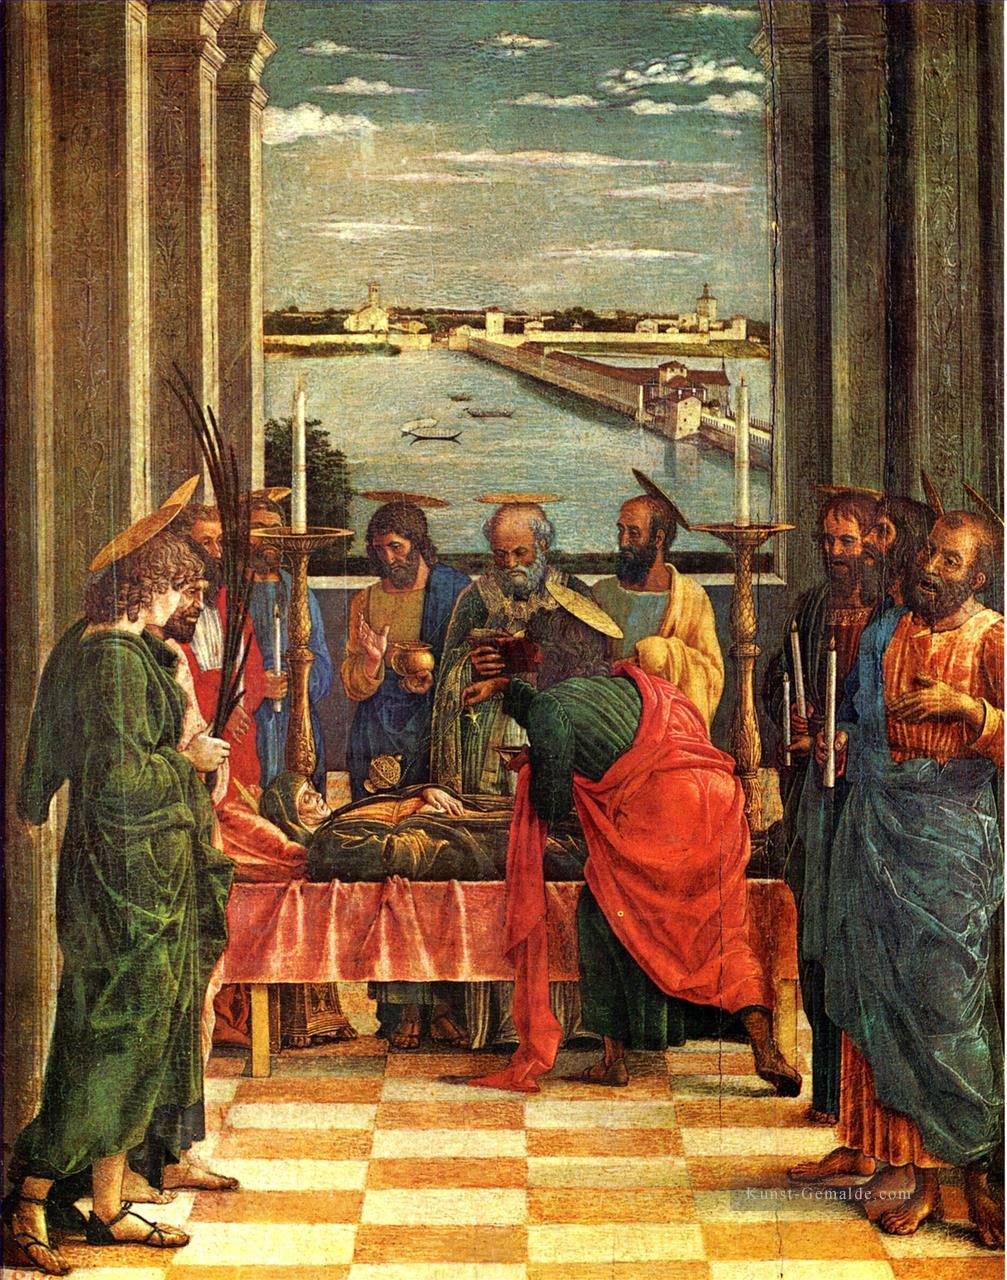 Todes der Jungfrau Renaissance Maler Andrea Mantegna